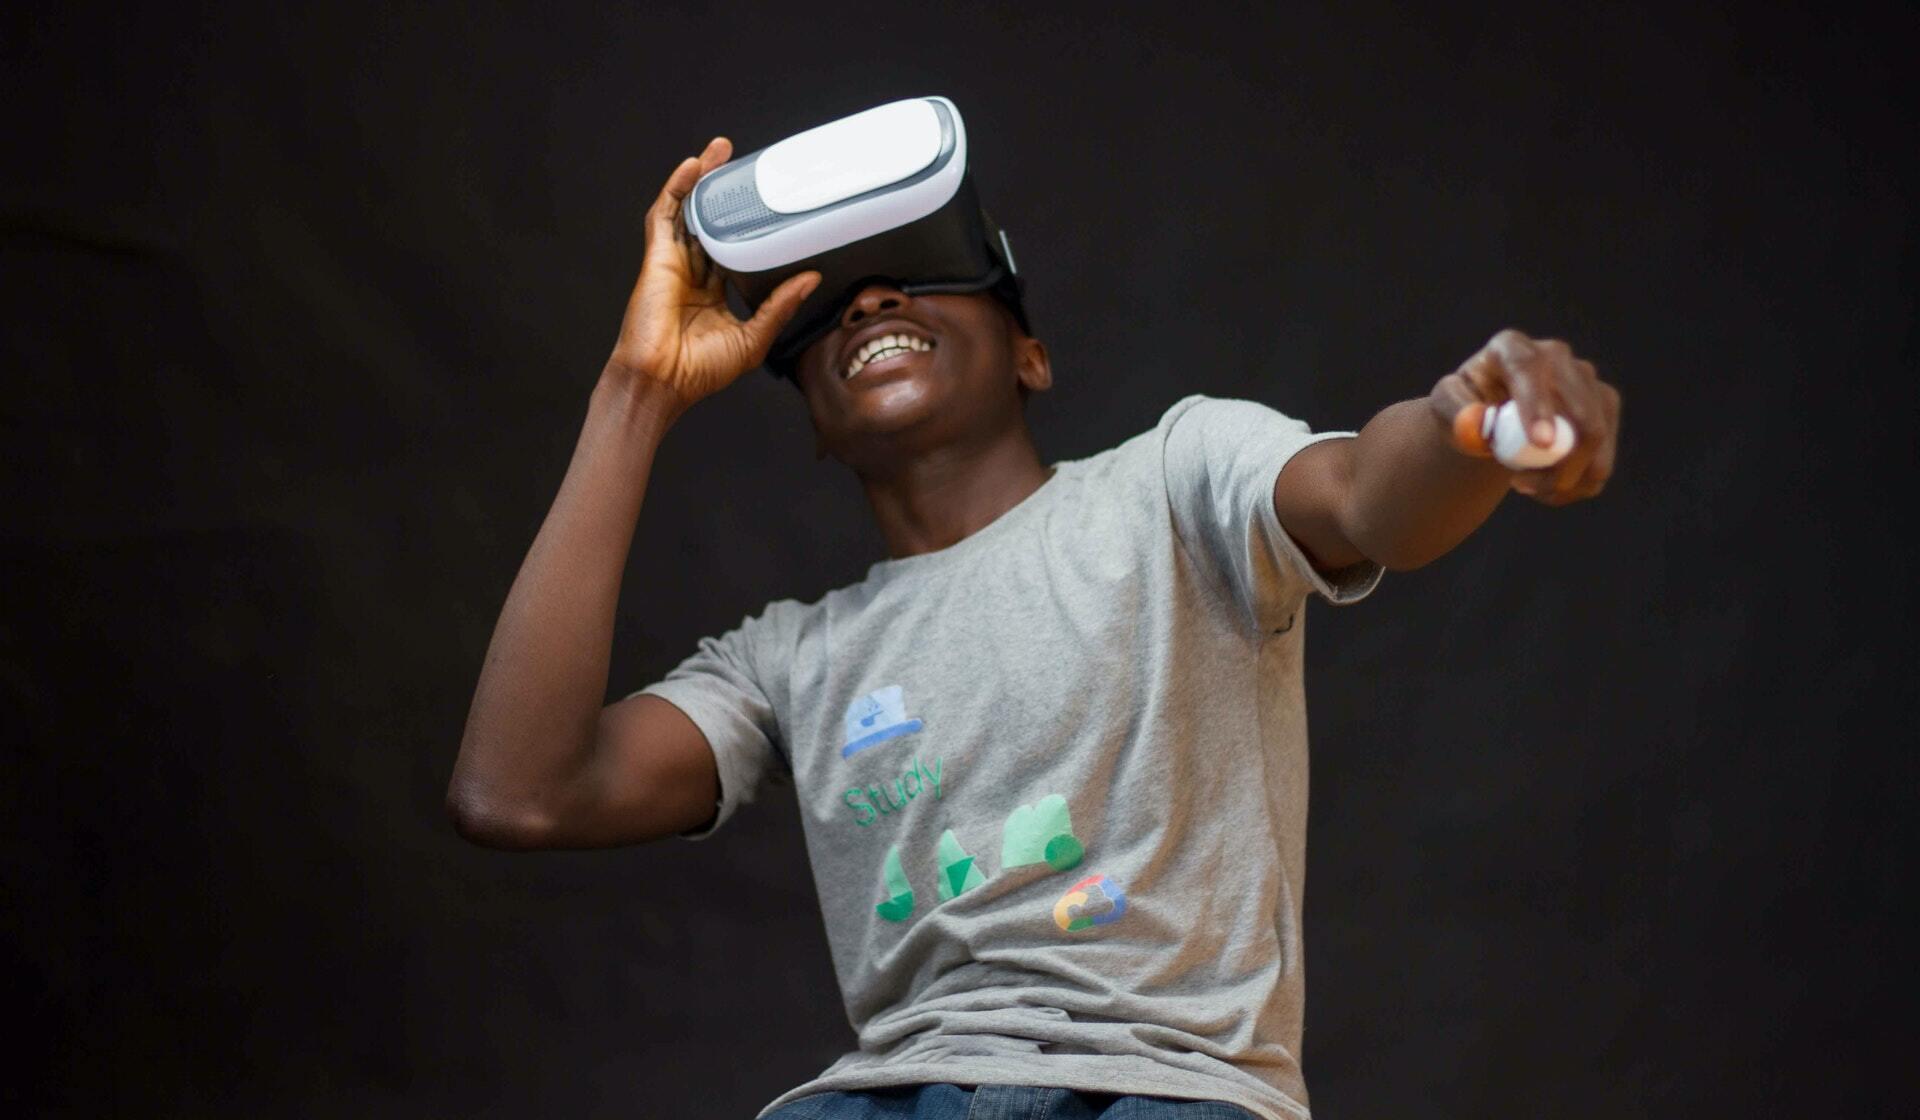 PODCAST 111: Futurist Churches & The Virtual Reality Multisite Campus